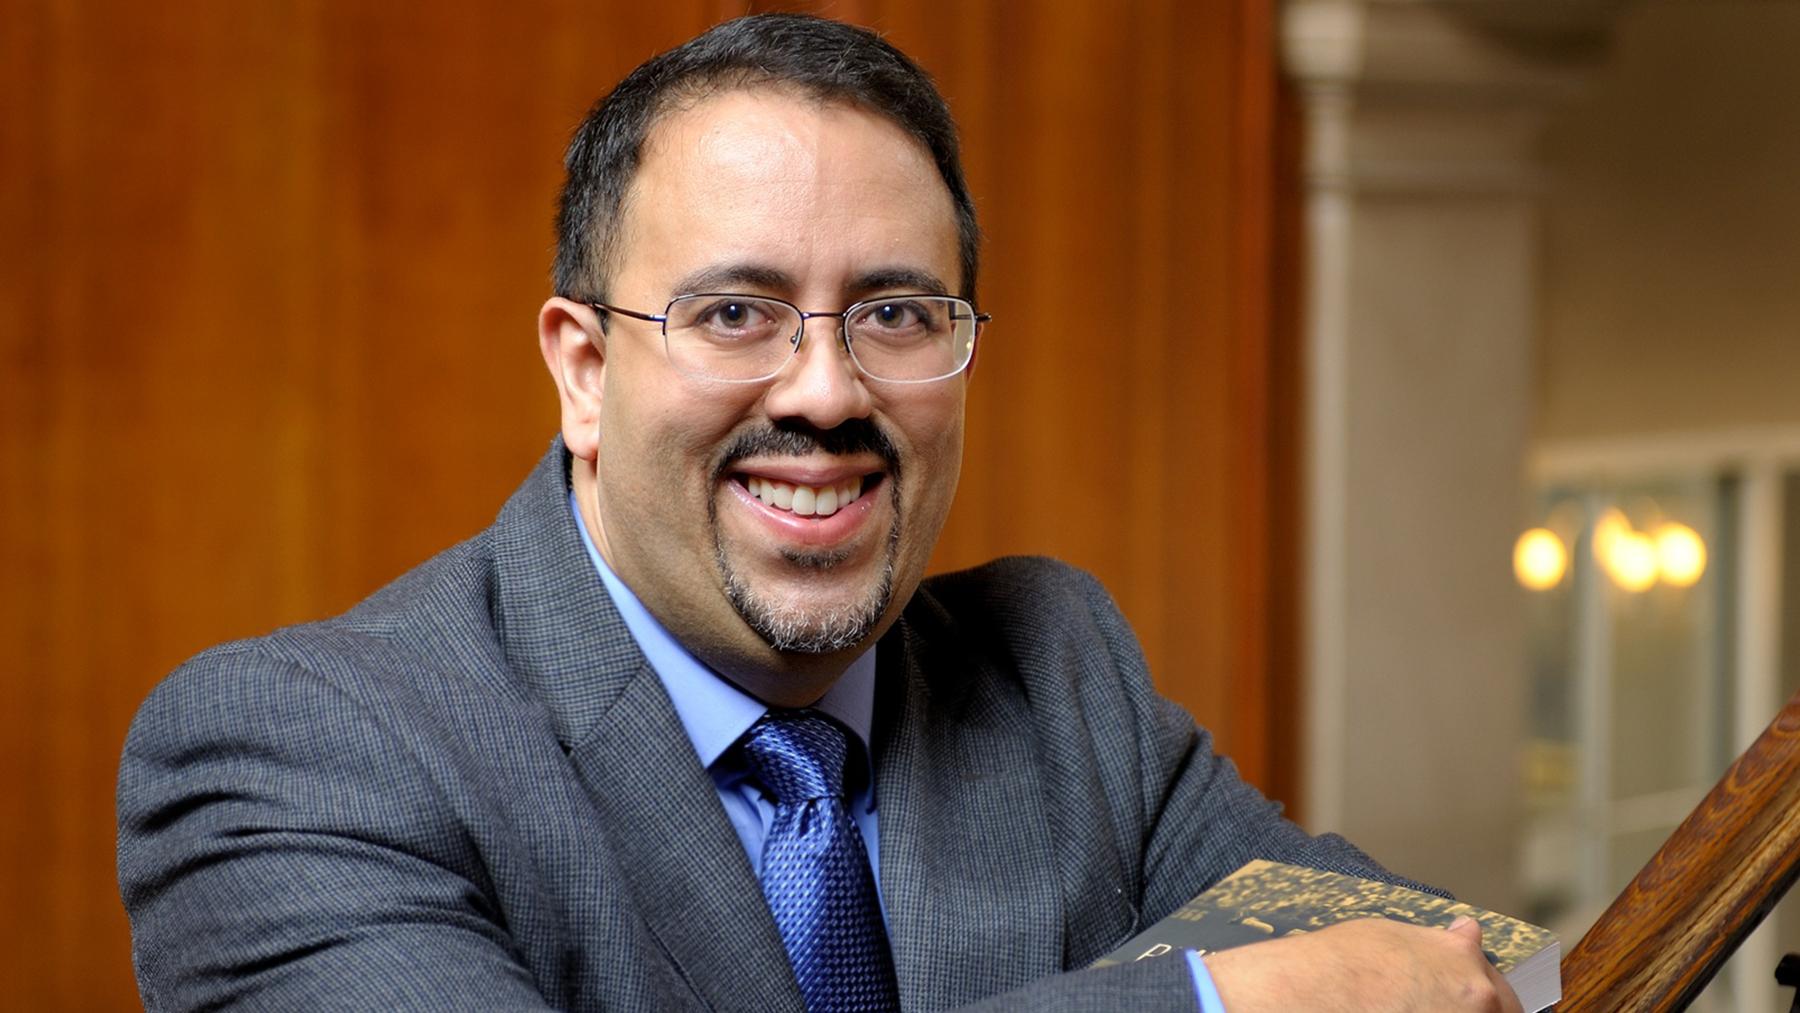 Photo of Professor Adrian Burgos